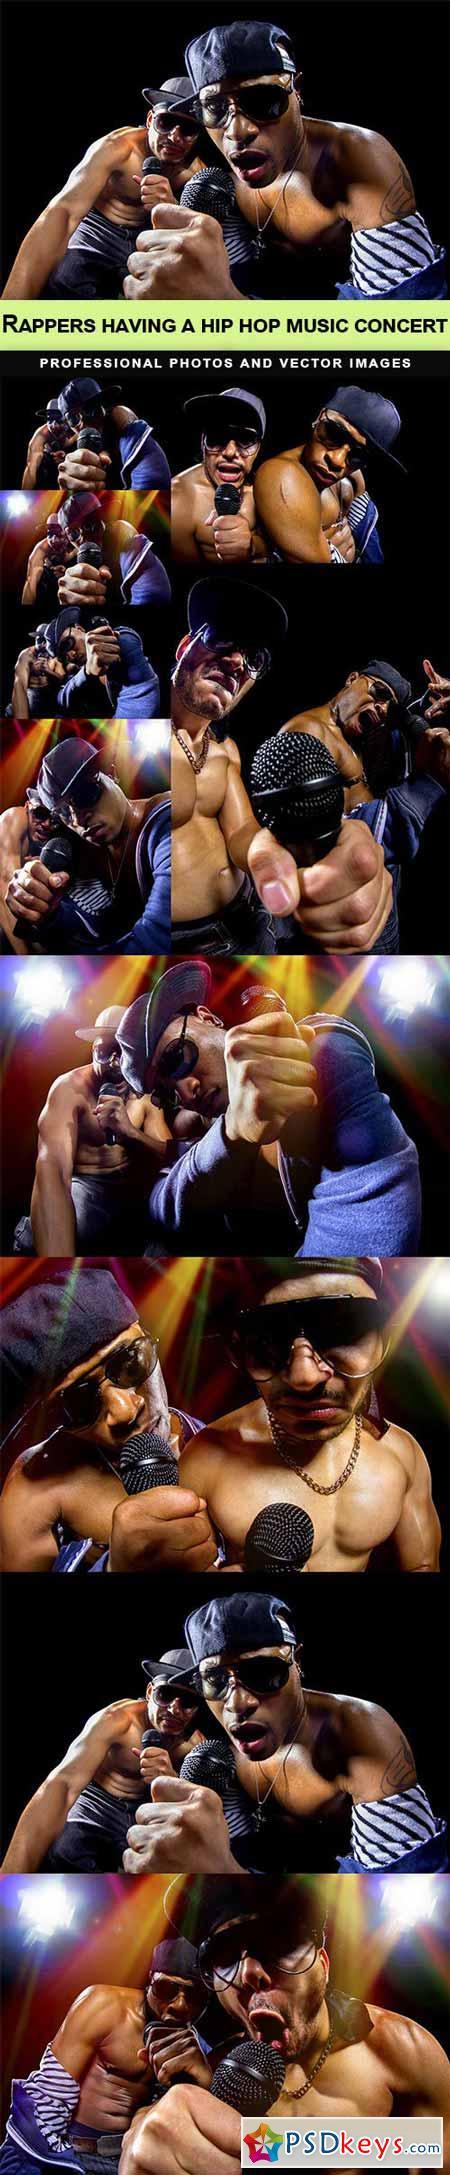 Rappers having a hip hop music concert - 10 UHQ JPEG